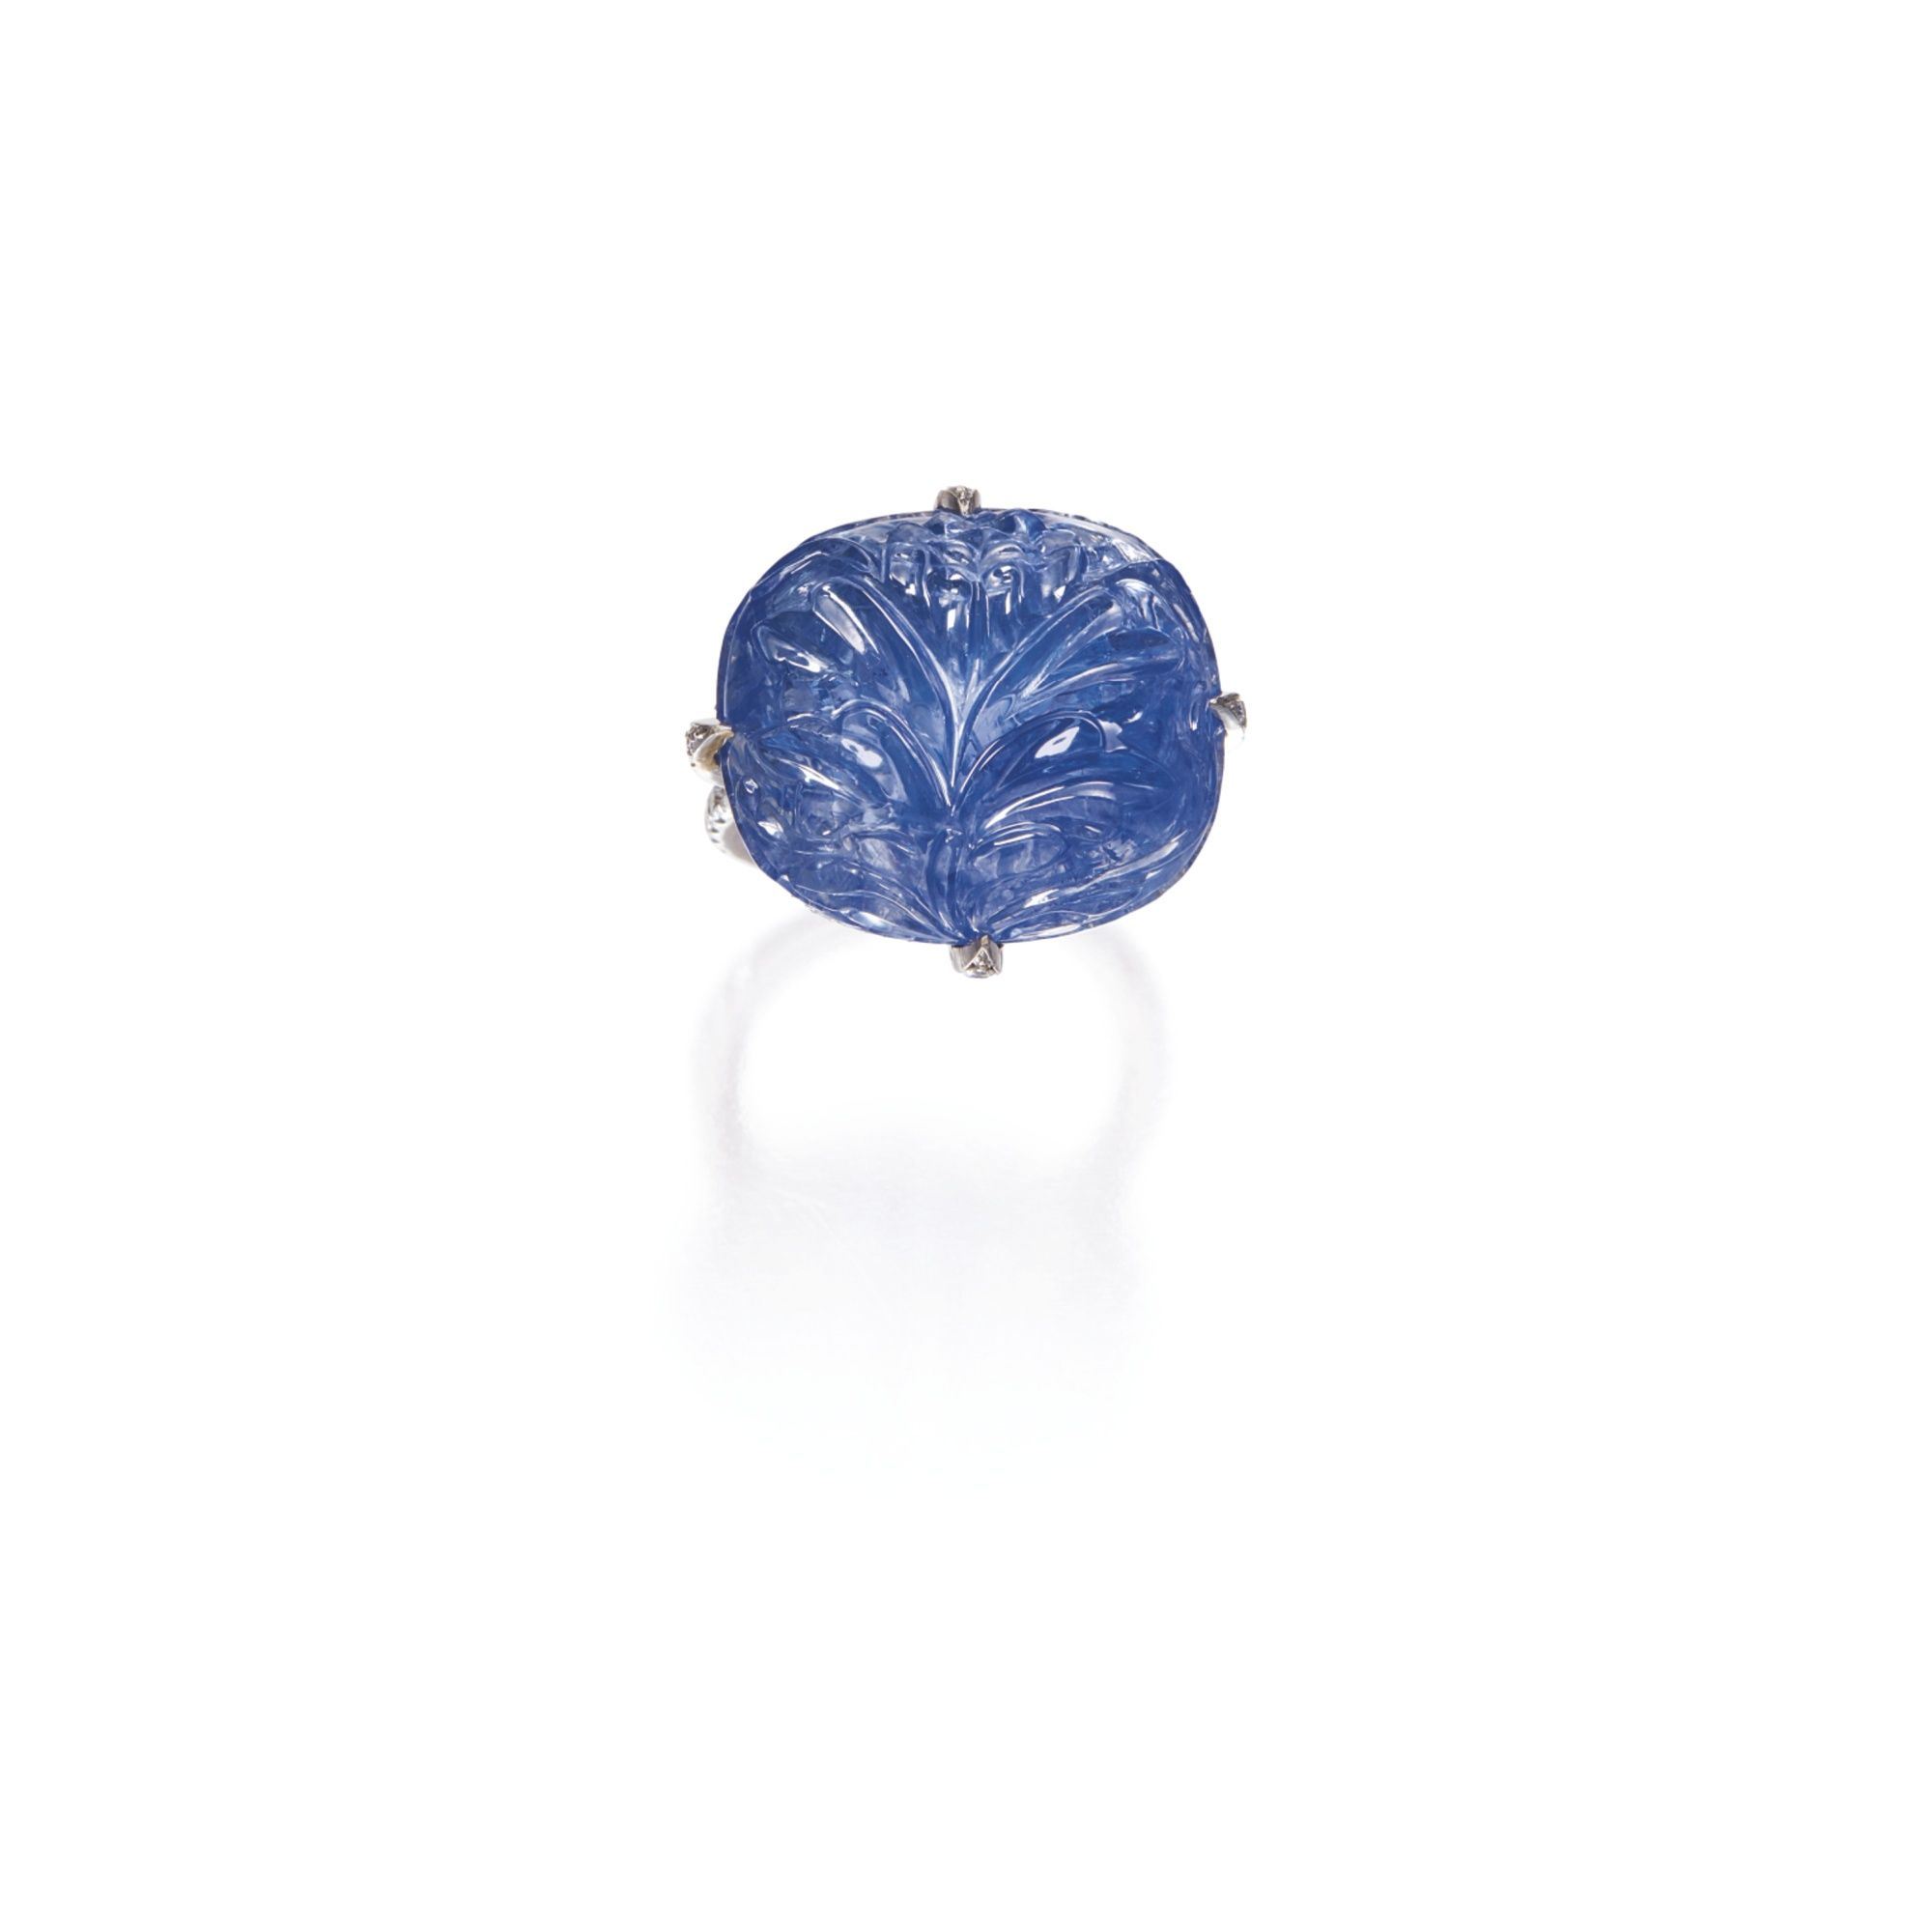 18 Karat White Gold, Carved Sapphire and Diamond Ring, Michele della Valle